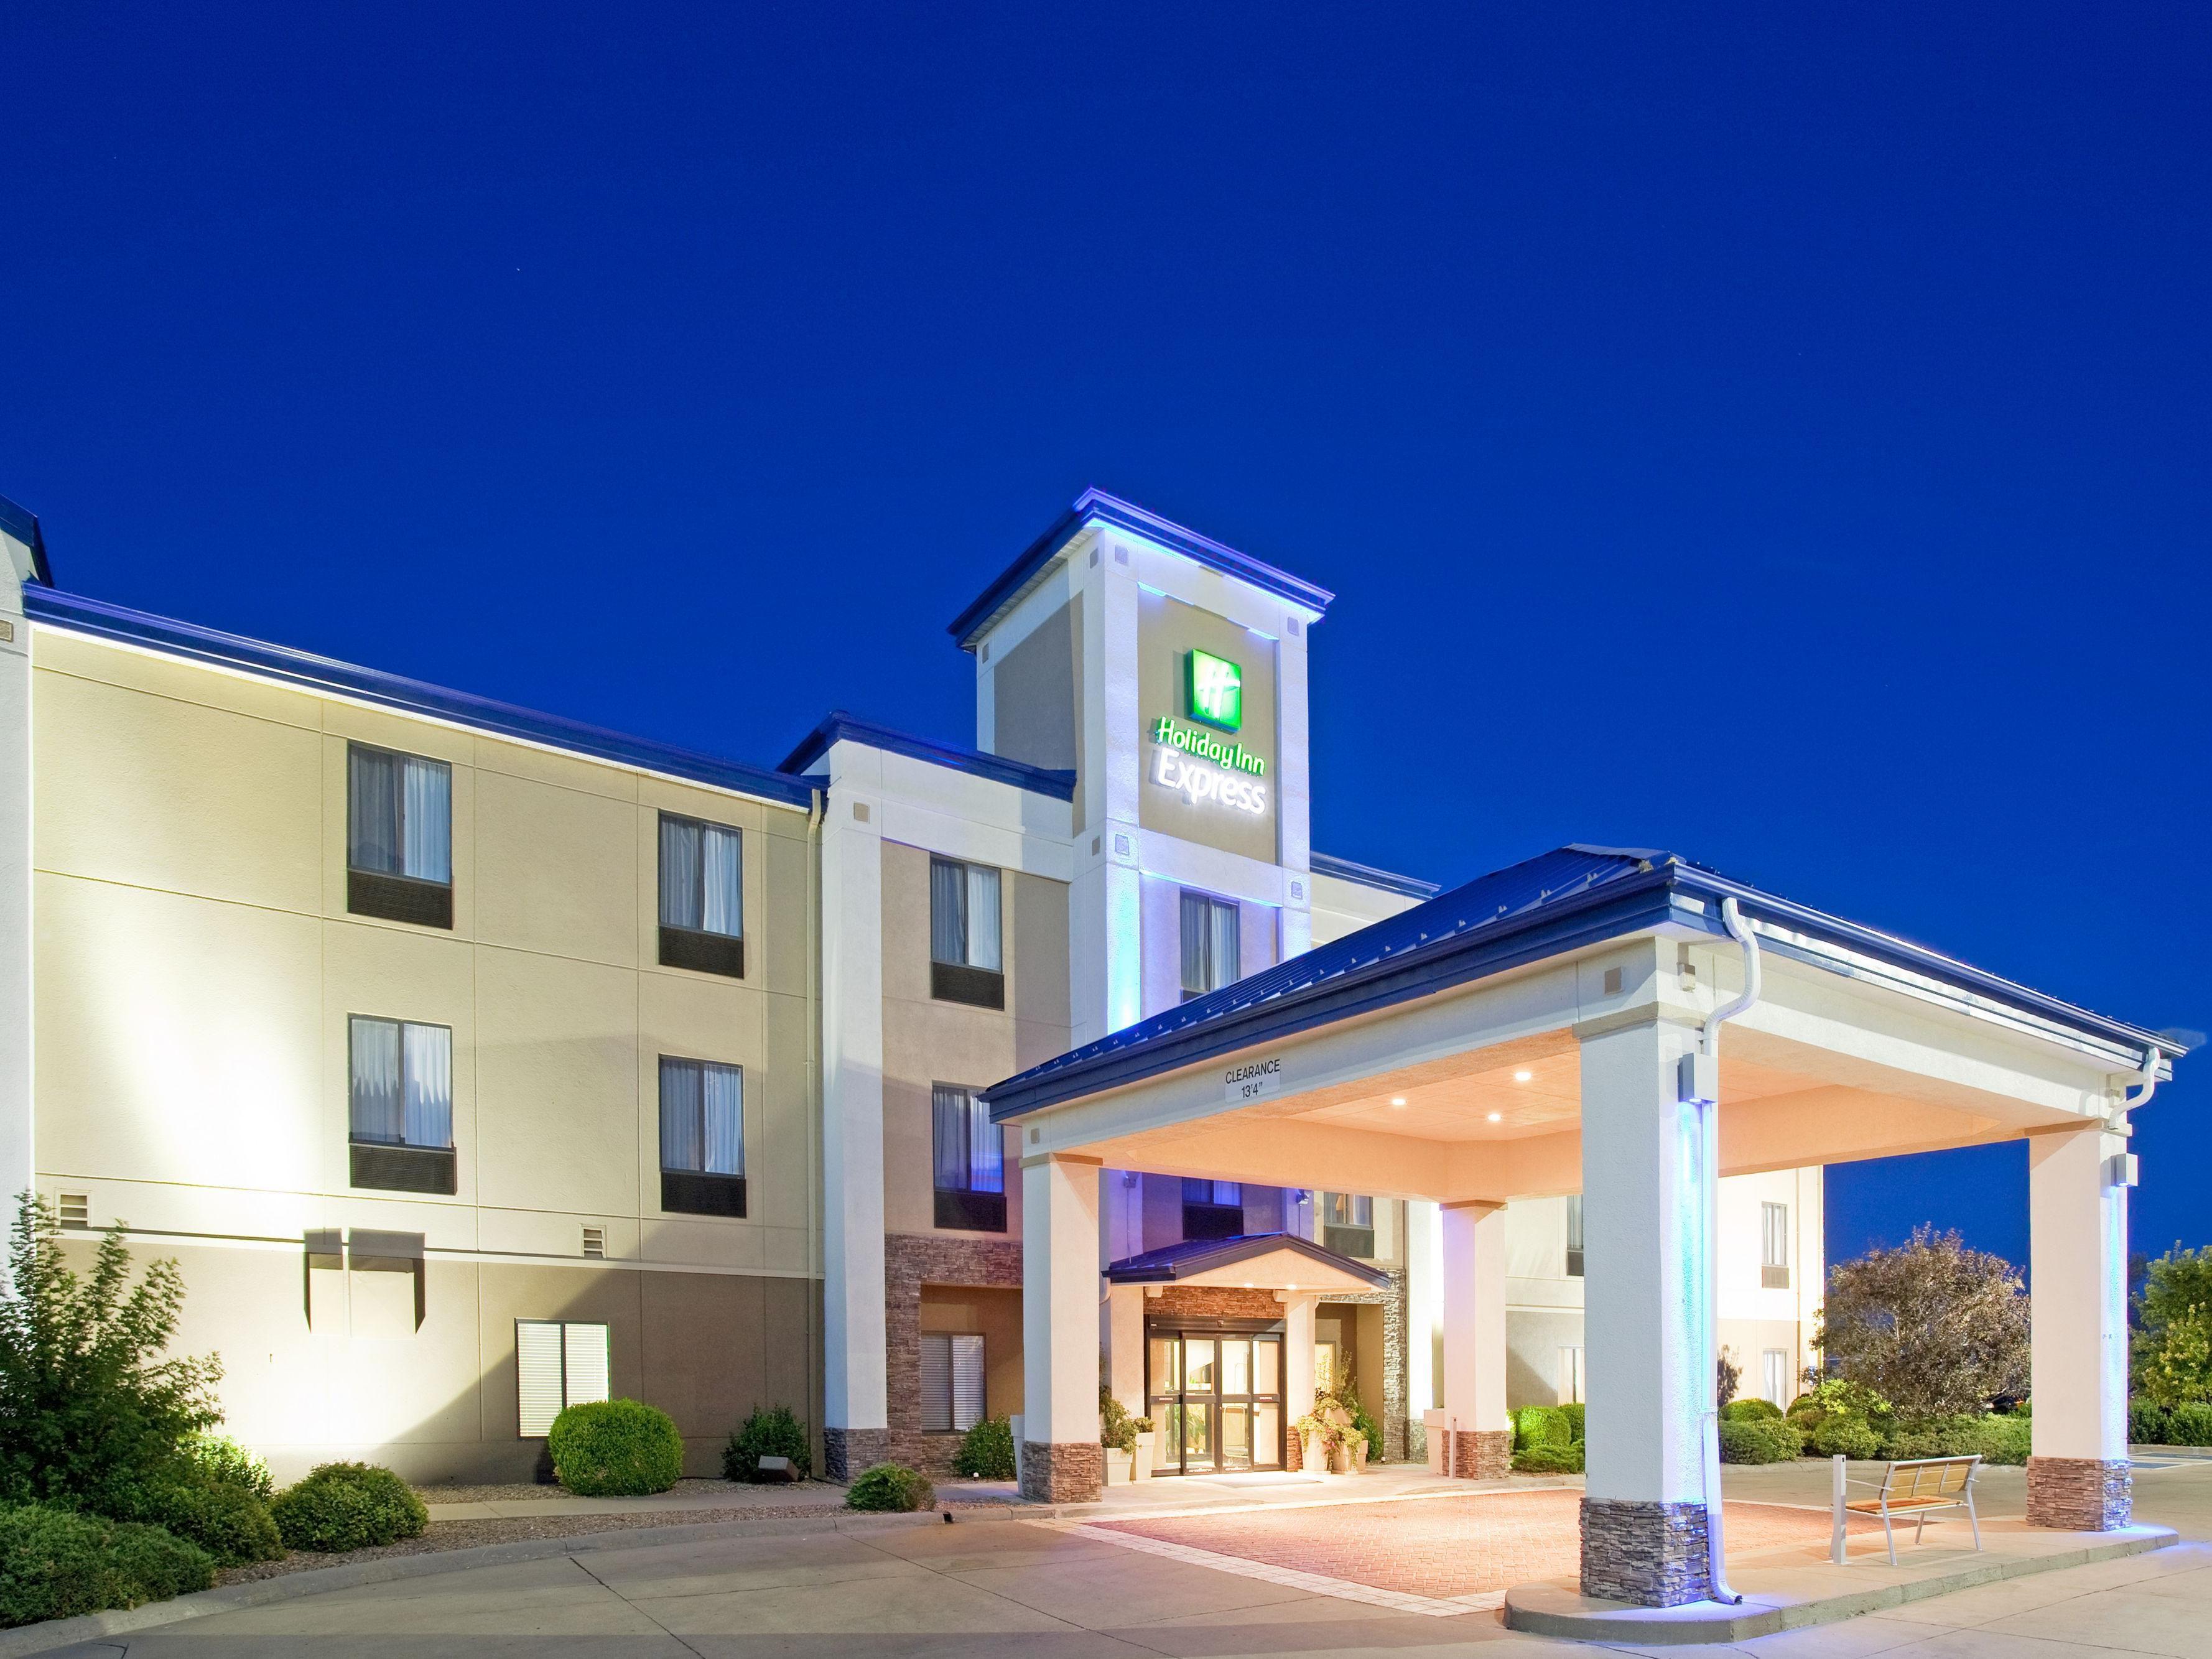 garden city motels. garden city motels